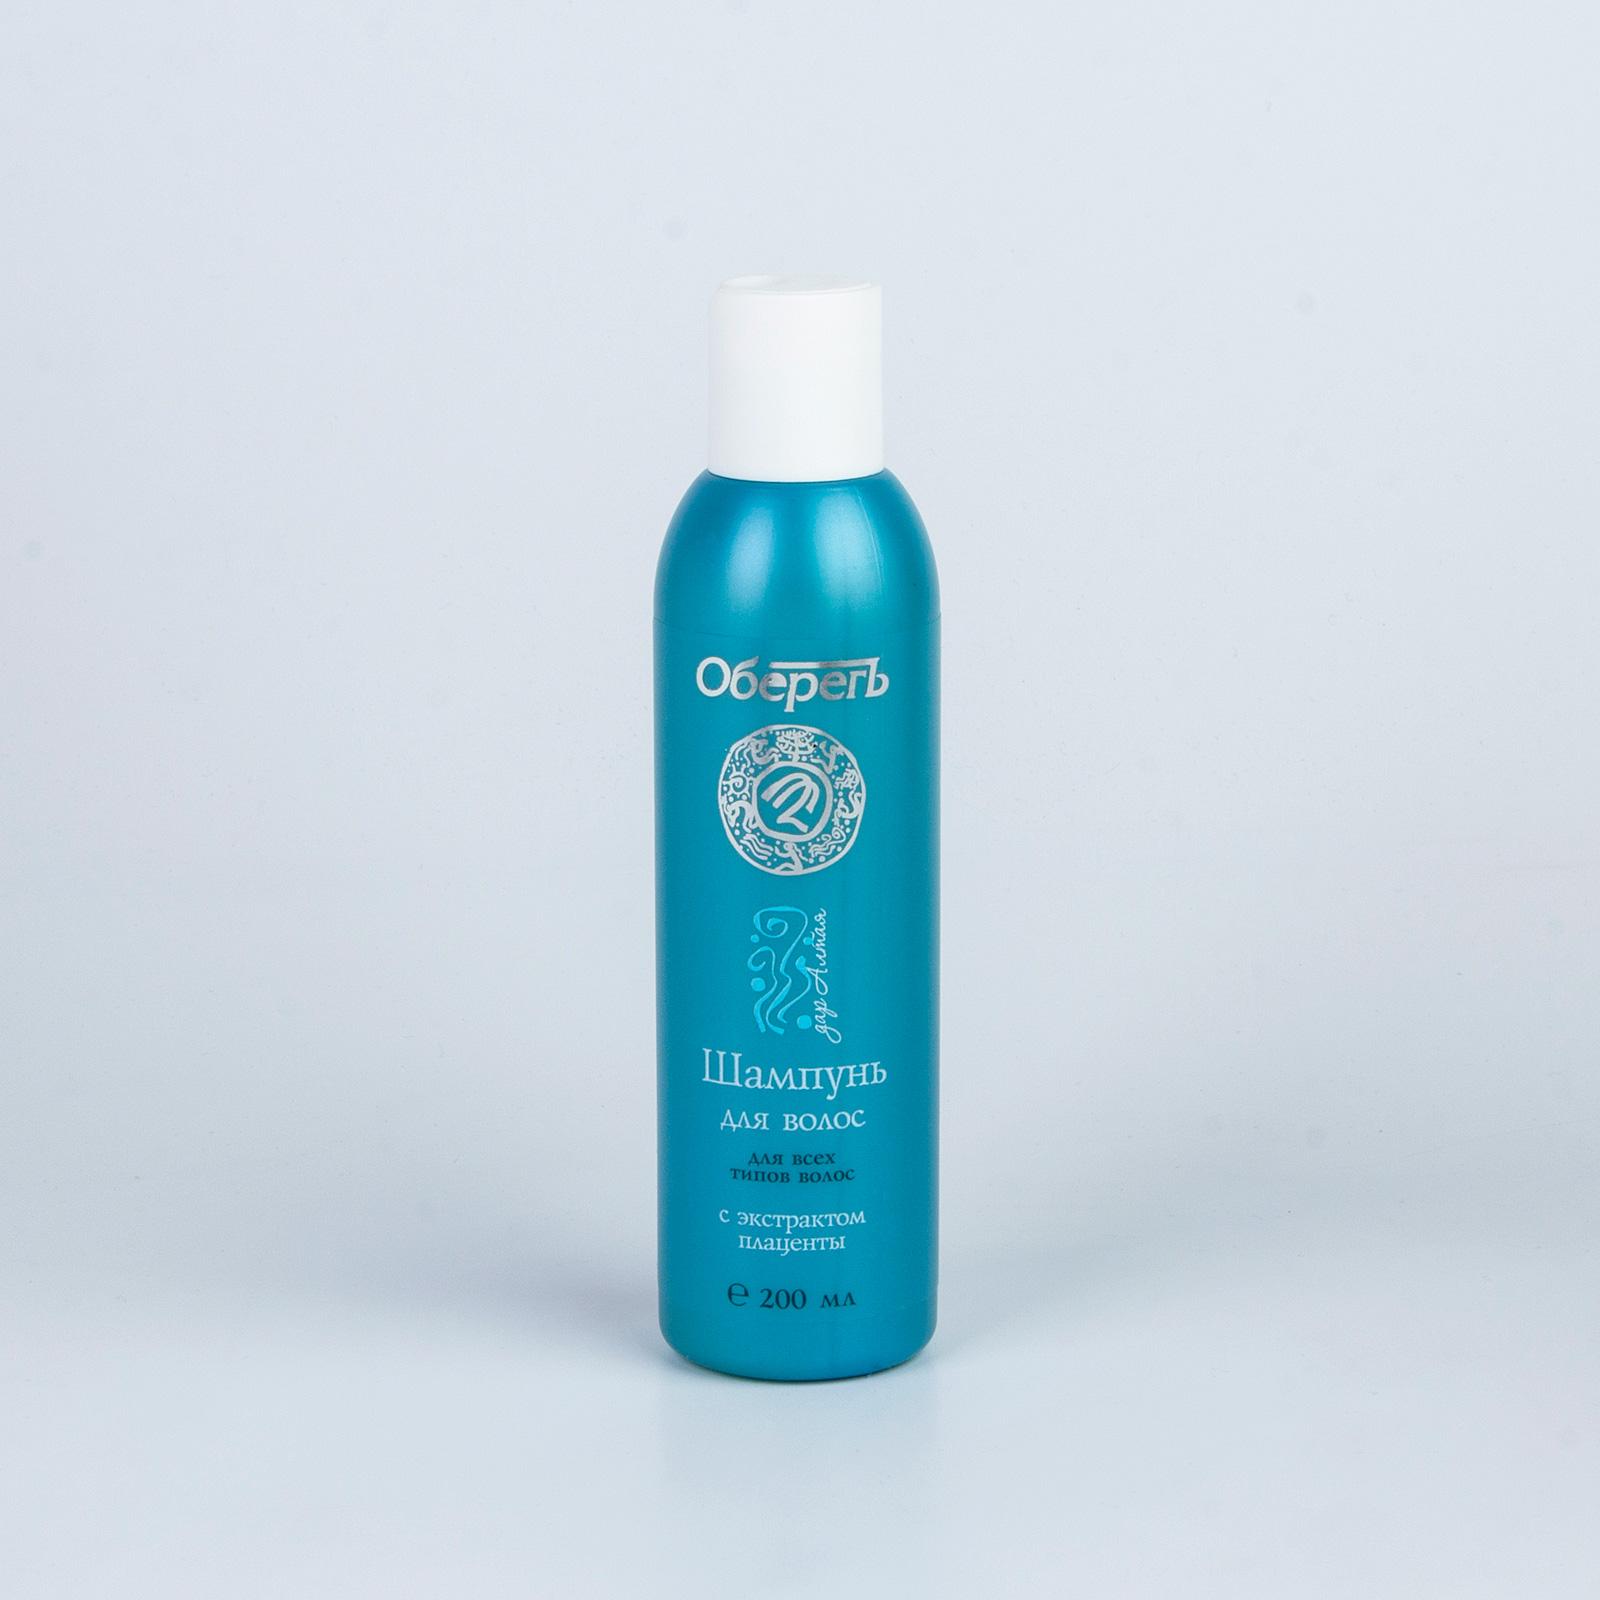 Плацентарный шампунь для волос